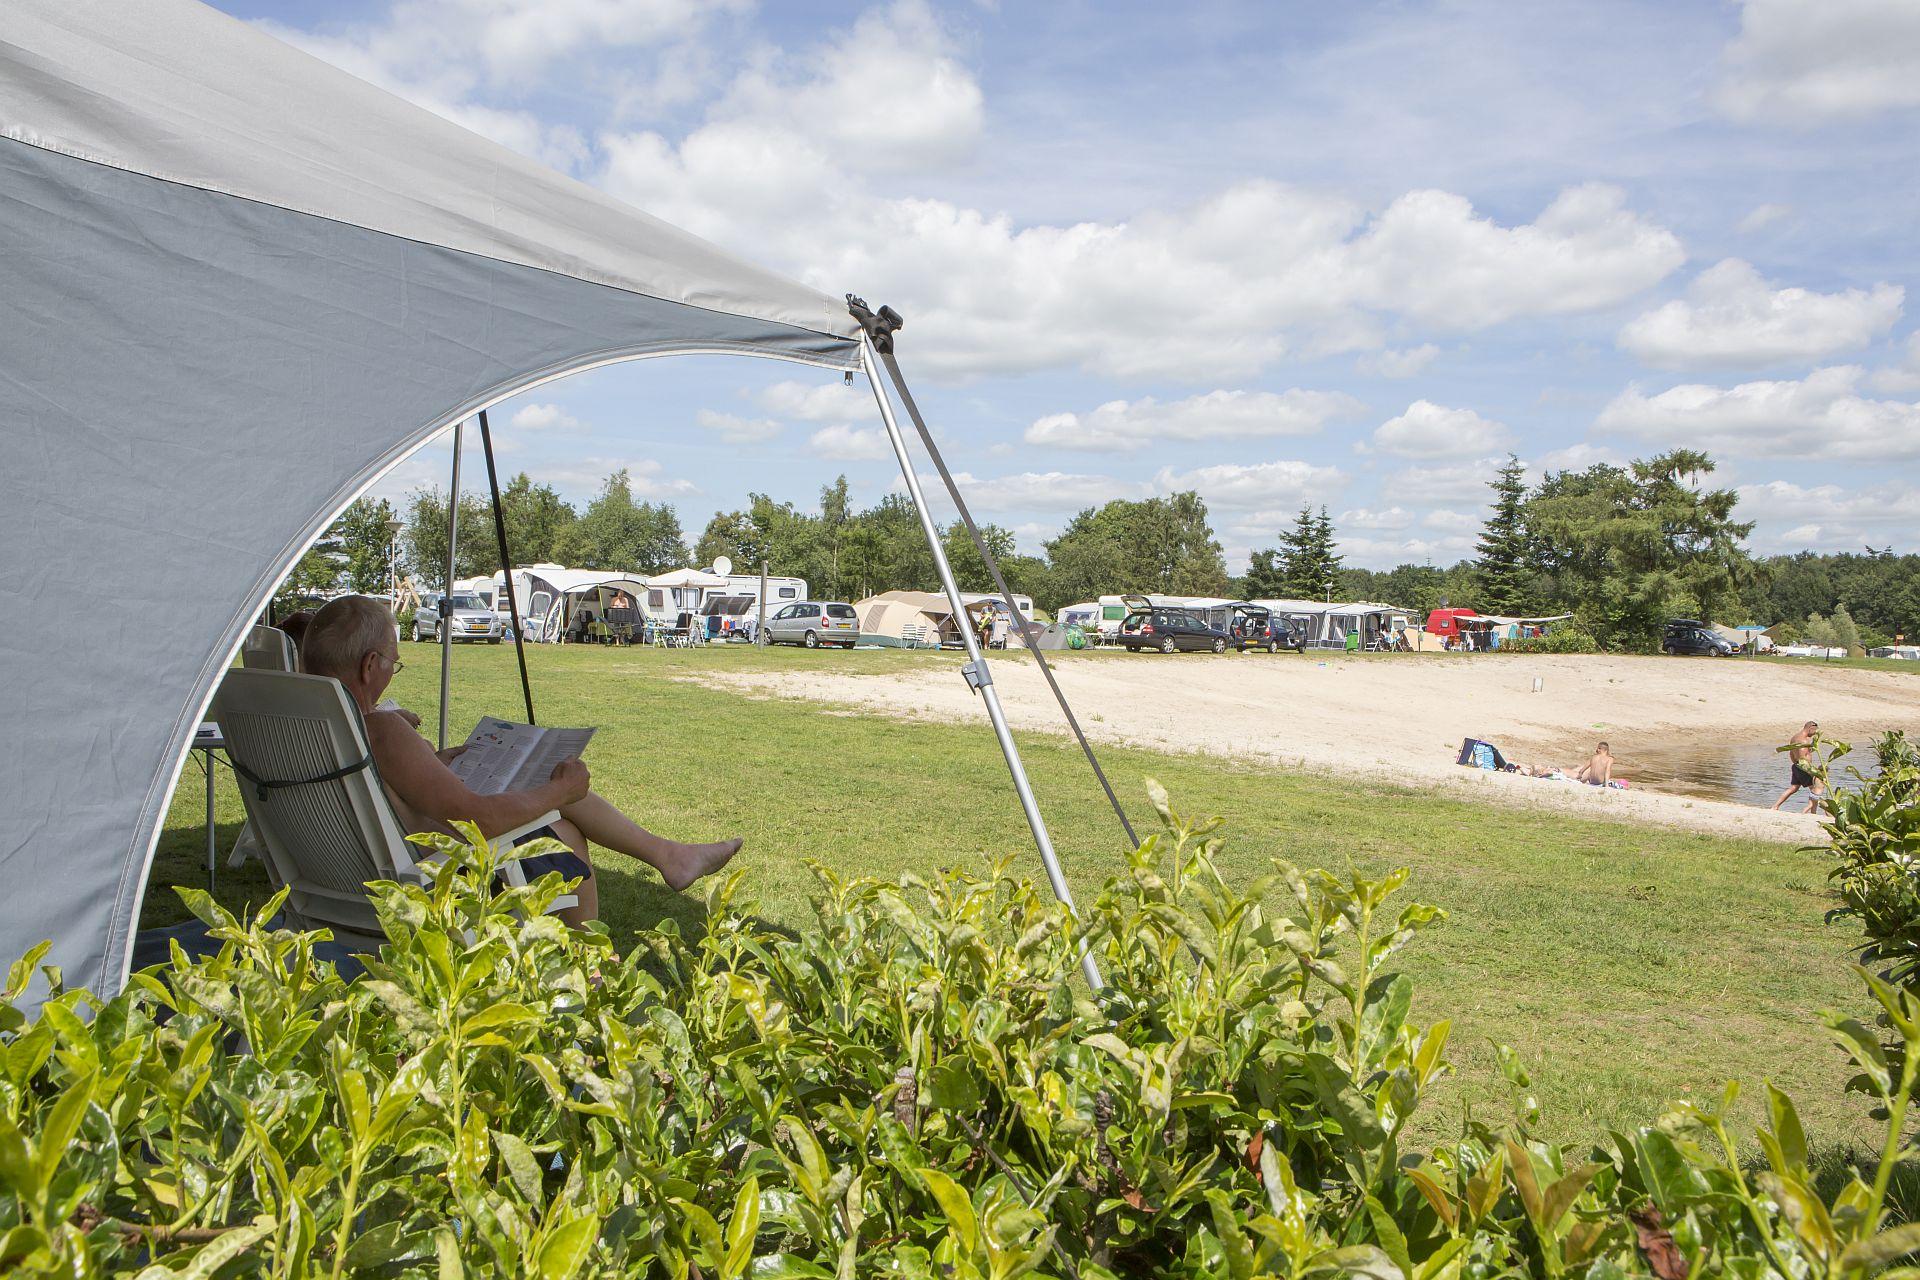 Camping leven met verrassende strandvakantie - Camping leven